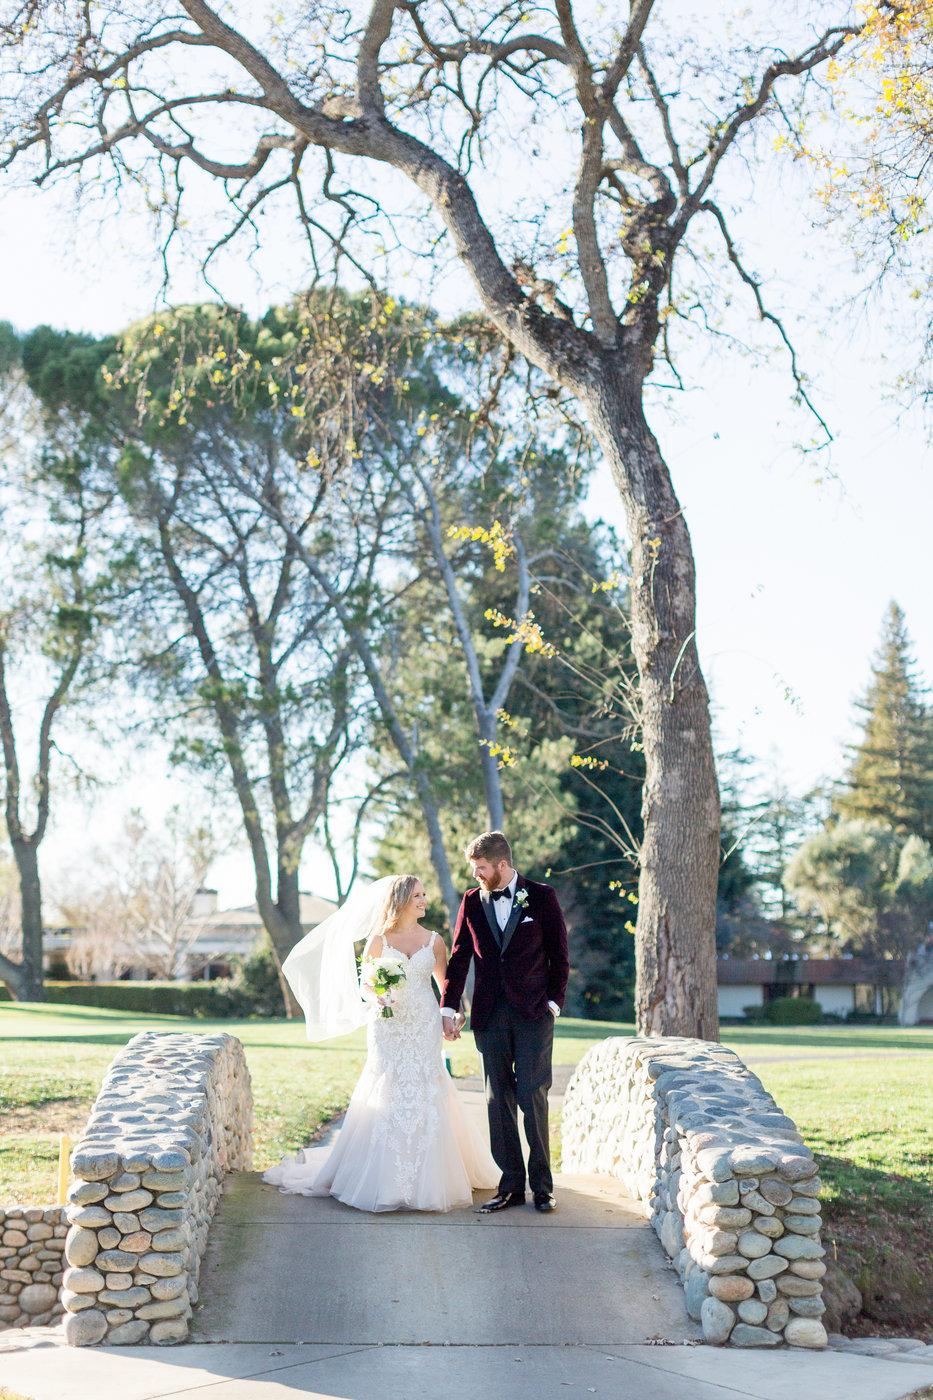 New-Years-Eve-Butte-Creek-Country-Club-wedding-photos.jpg